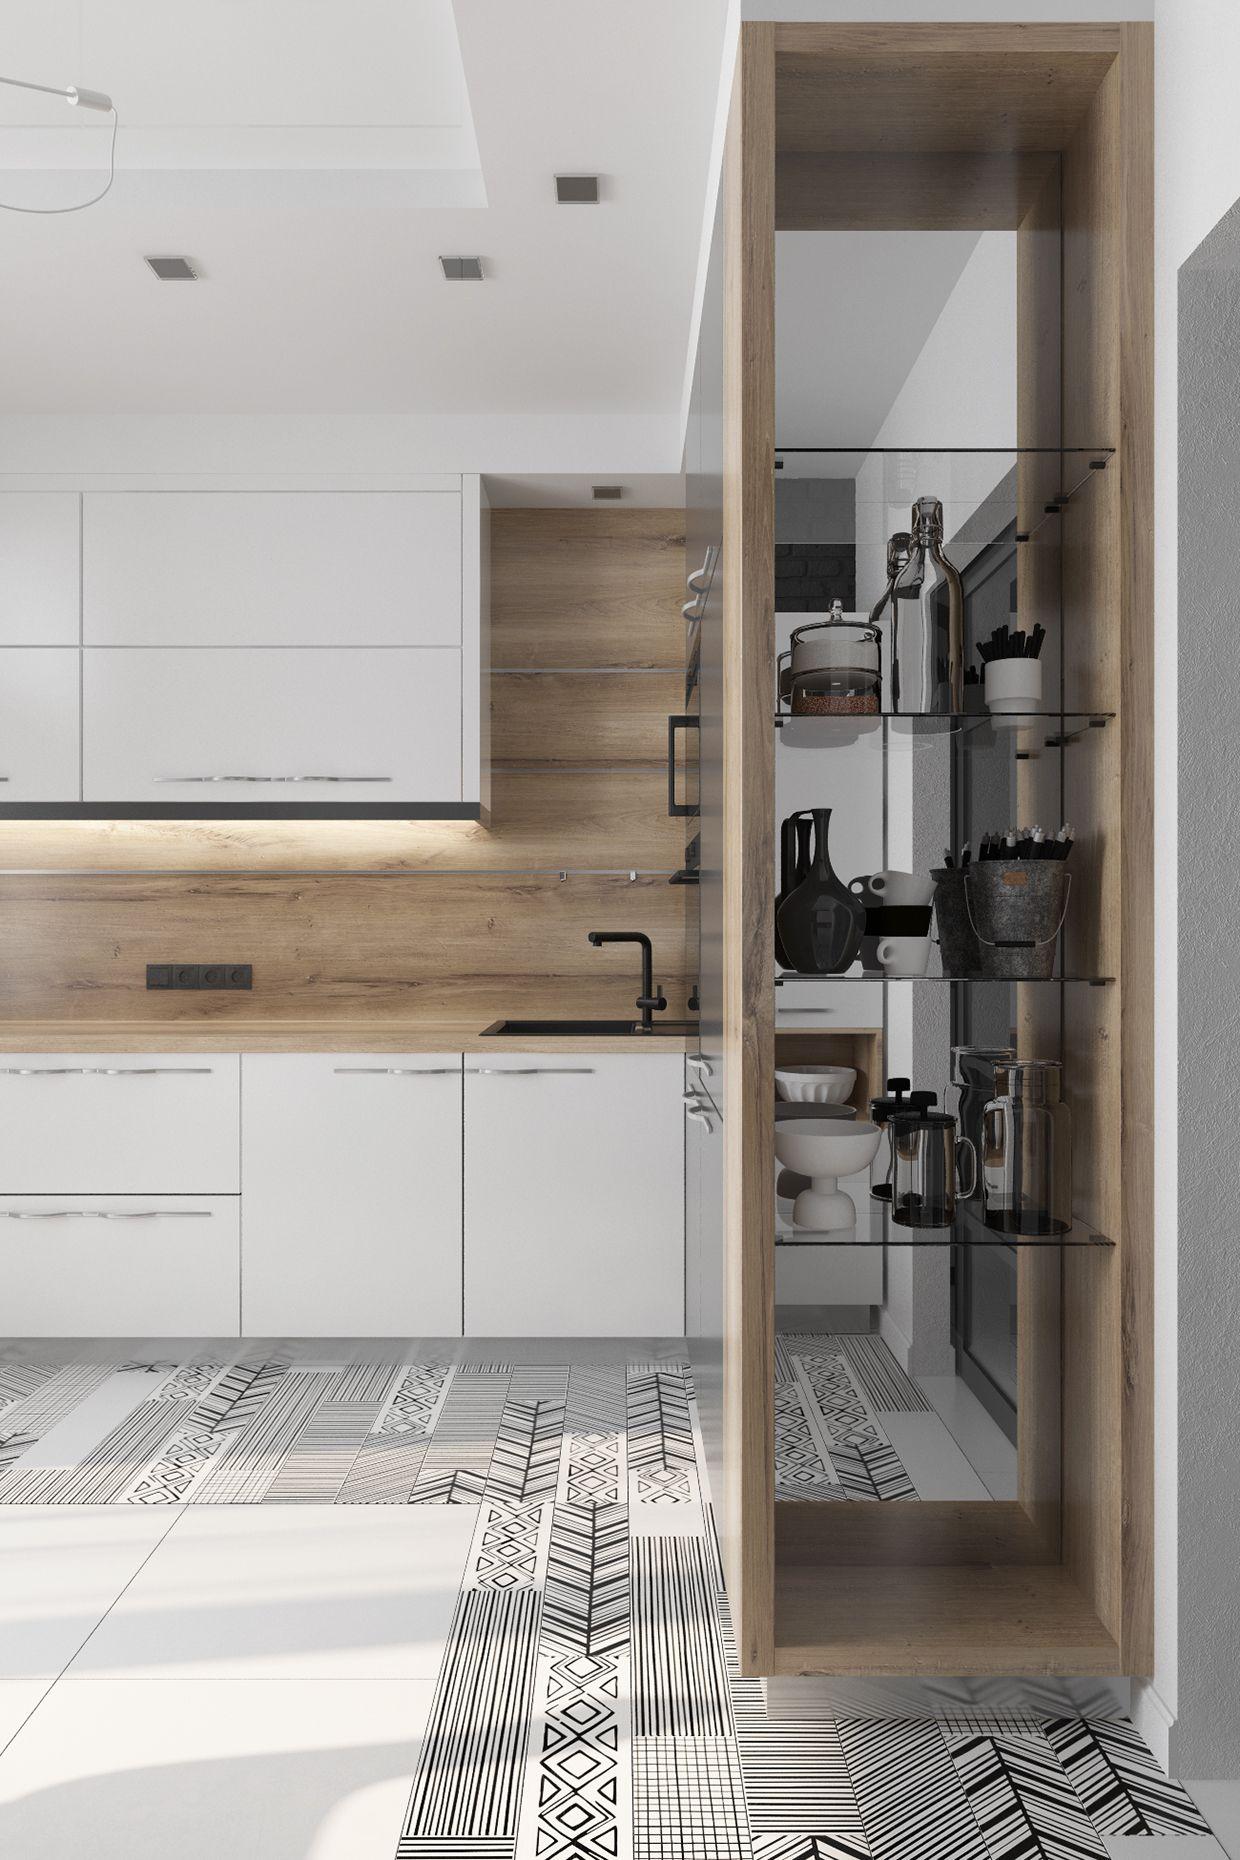 Pin by Juan Mora on Interiors | Pinterest | Kitchens, Kitchen design ...